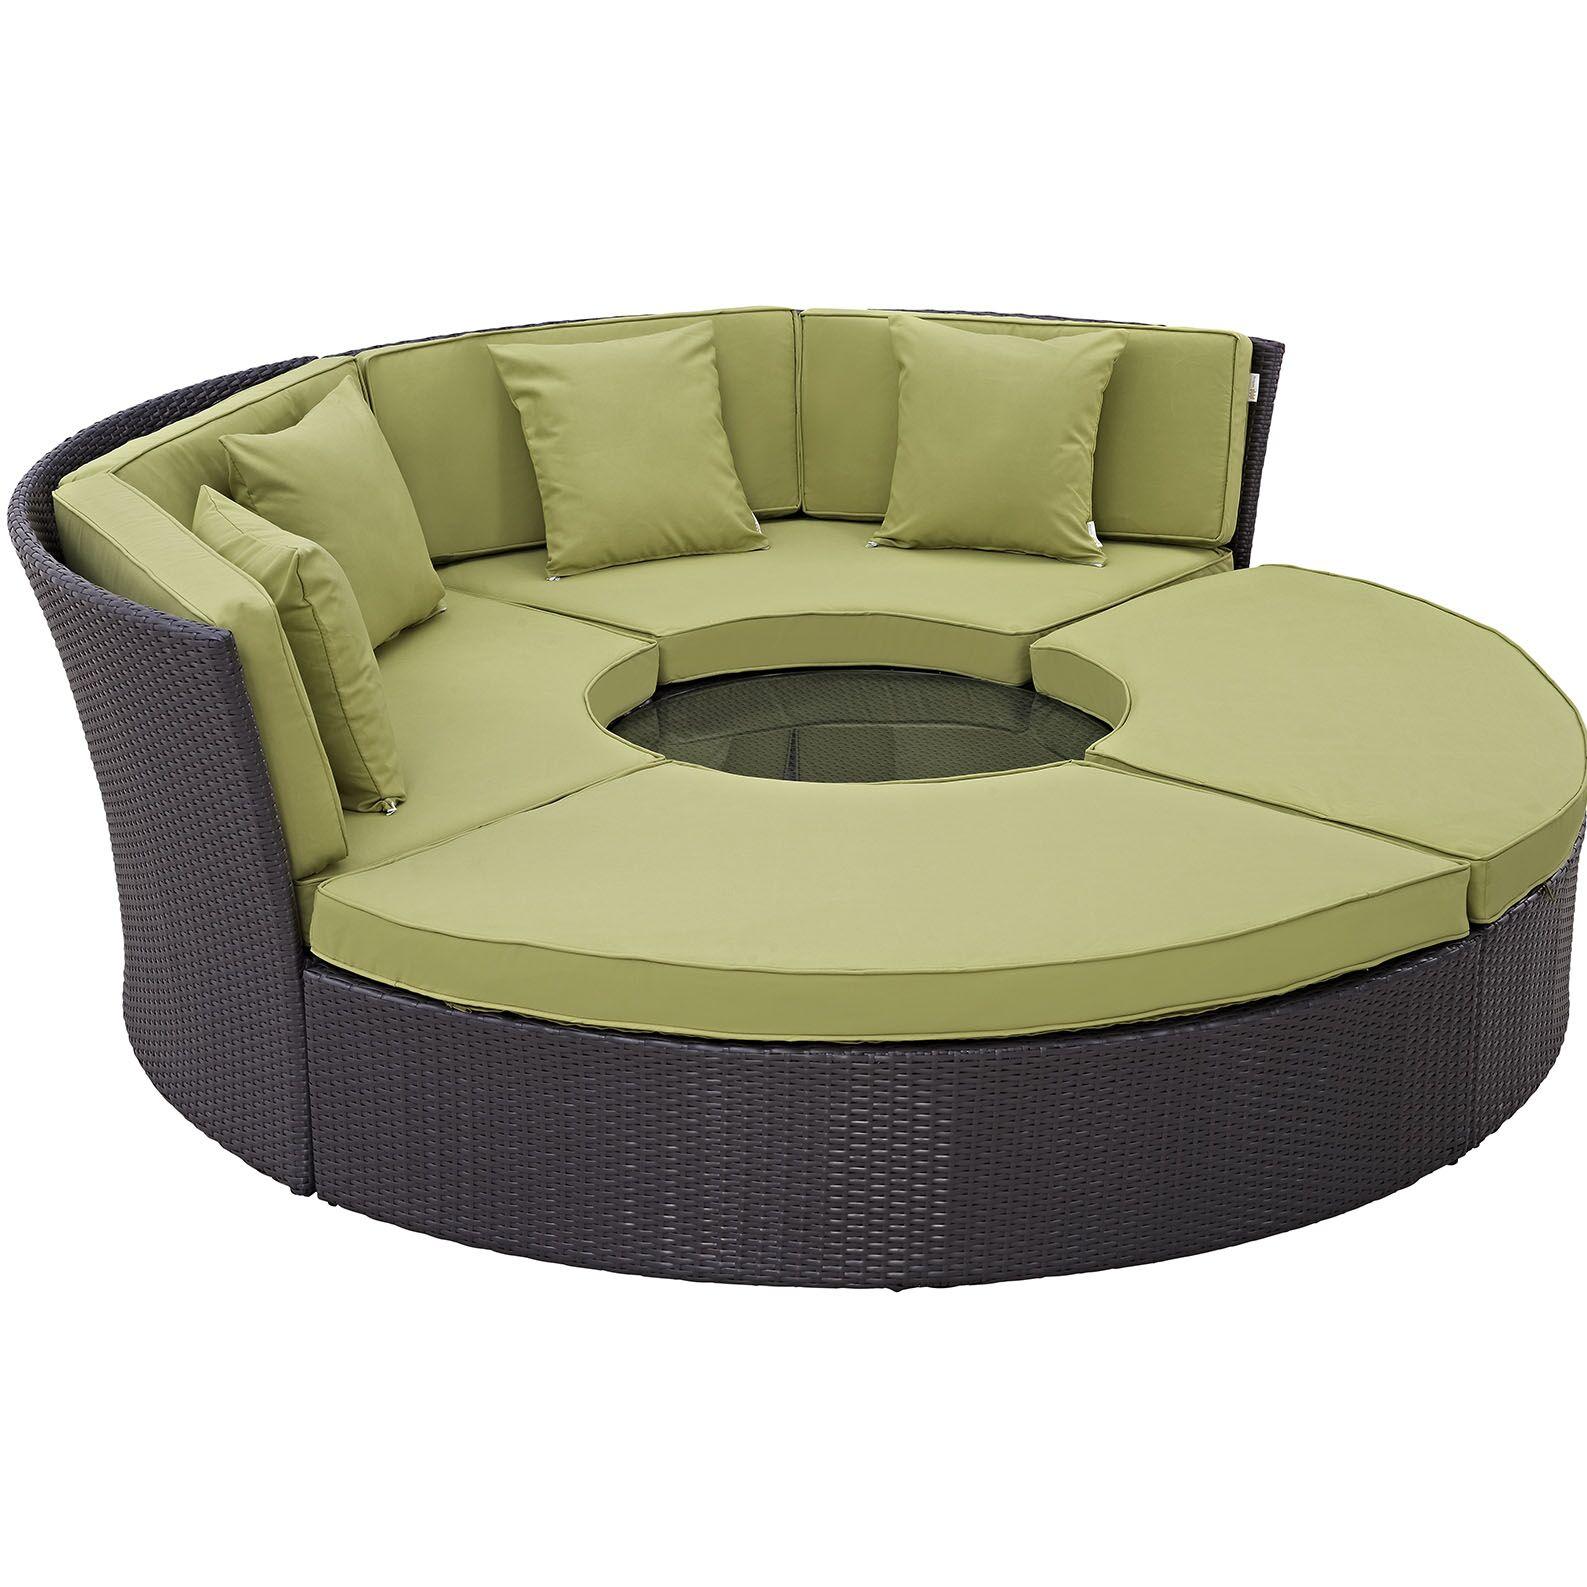 Ryele 5 Piece Rattan Sectional Set with Cushions Fabric: Peridot